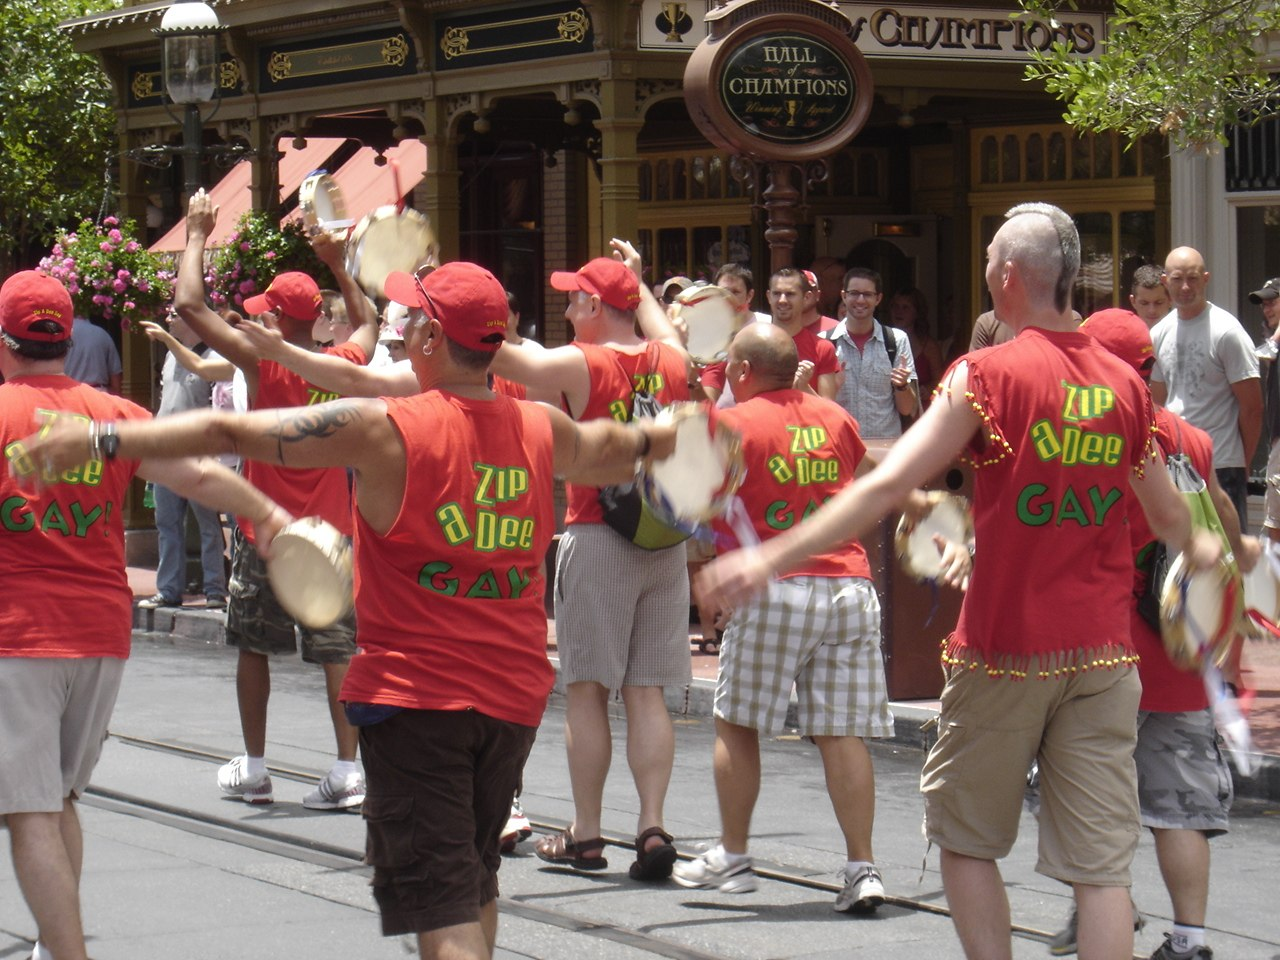 Zip-a-Dee-Doo Gay! Everyone loves a parade!